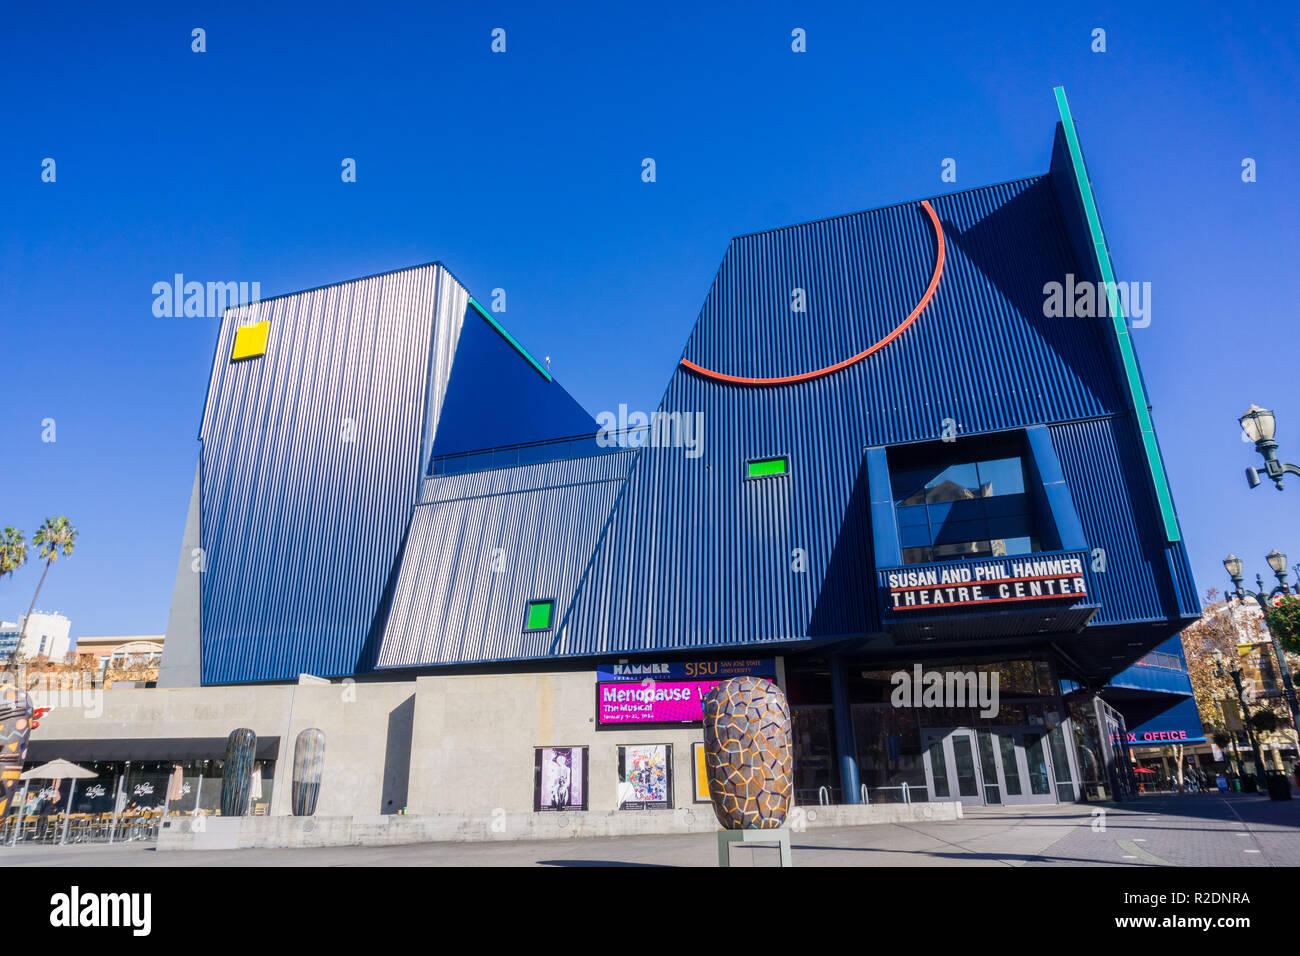 December 6, 2017 San Jose / CA / USA - Susan and Phil Hammer Theatre Center in downtown San Jose, near San Jose State University, south San Francisco  Stock Photo